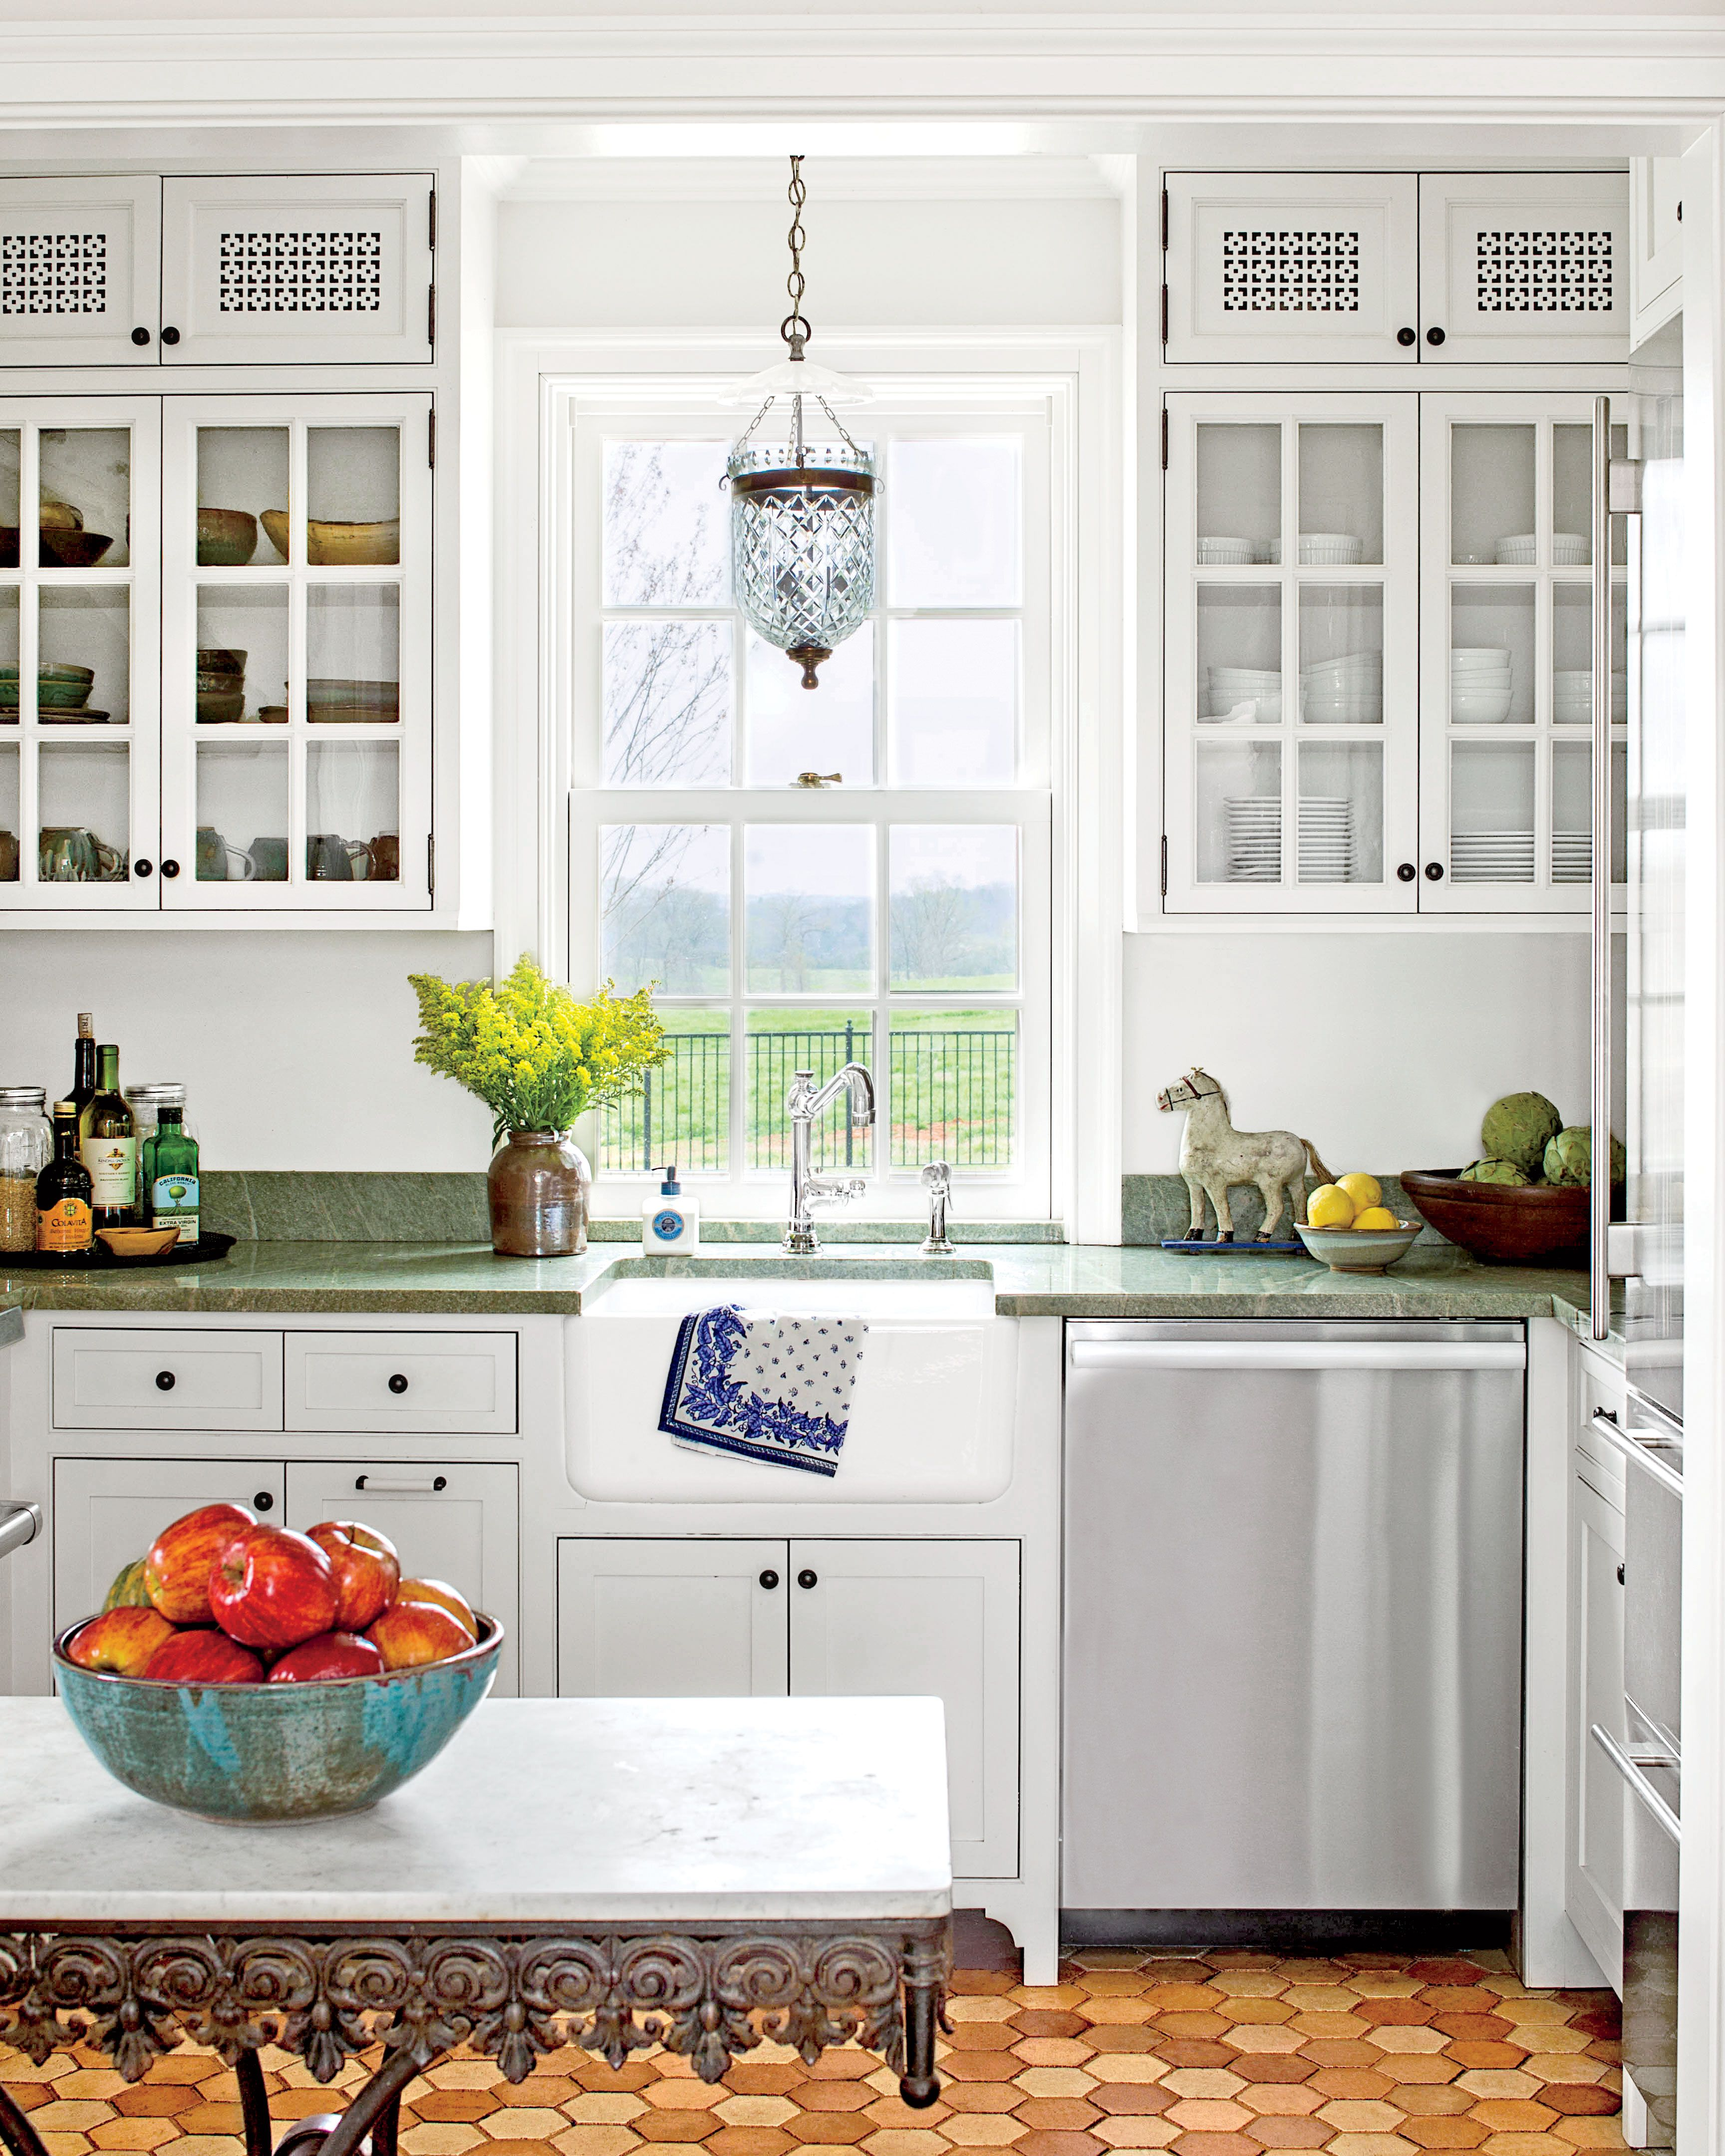 White Kitchen with Green Soapstone Counters | Kitchen Stuff ...